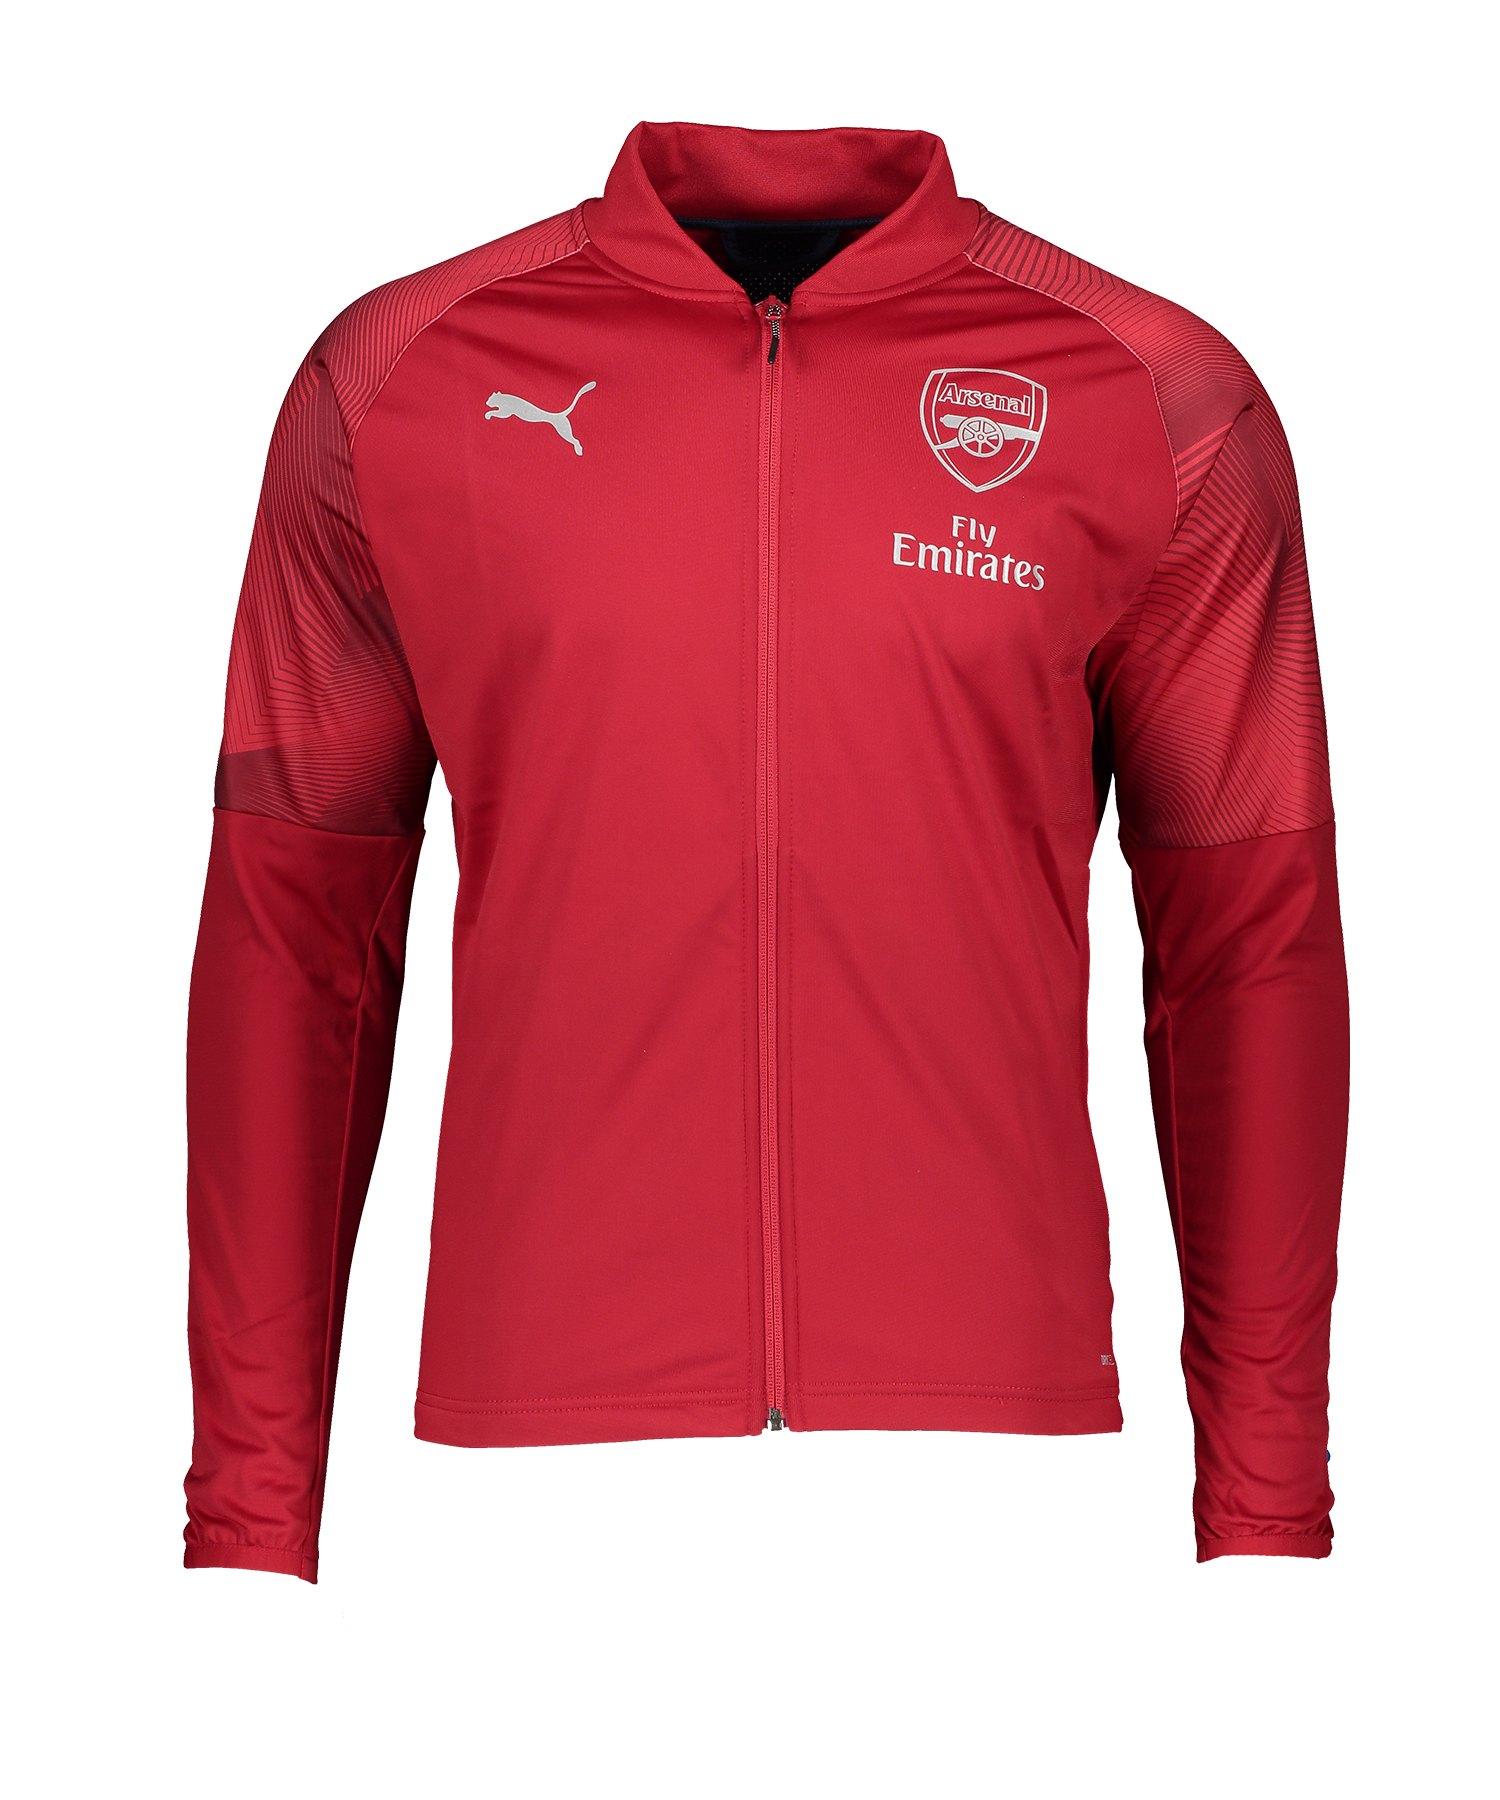 PUMA FC Arsenal Stadium Jacket Jacke Rot F01